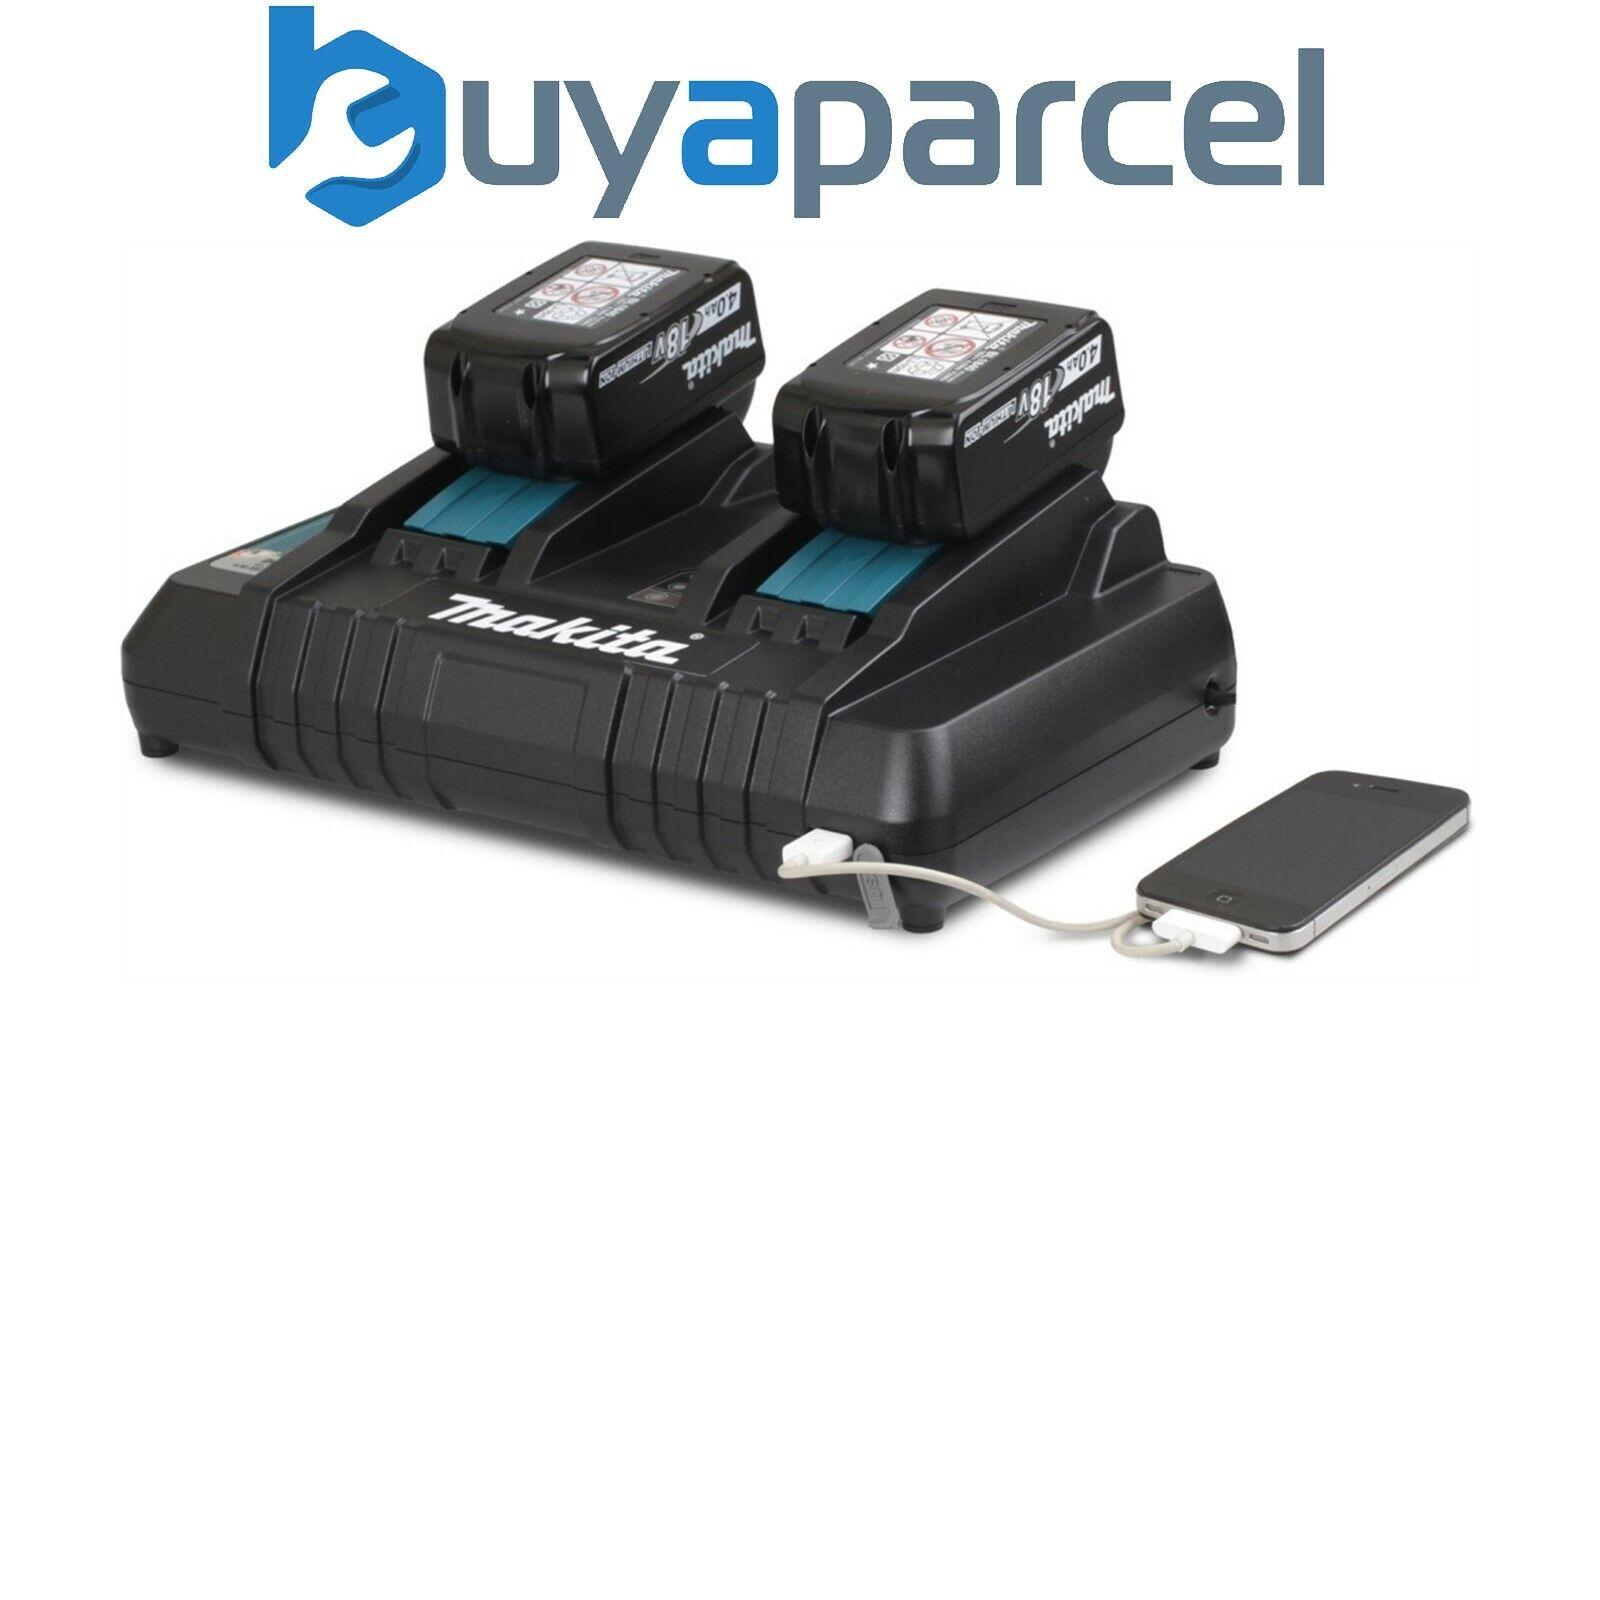 Makita Dc18rd 240v 18v Dual-Port Batterie Schnellladegerät mit USB Ladeanschluss